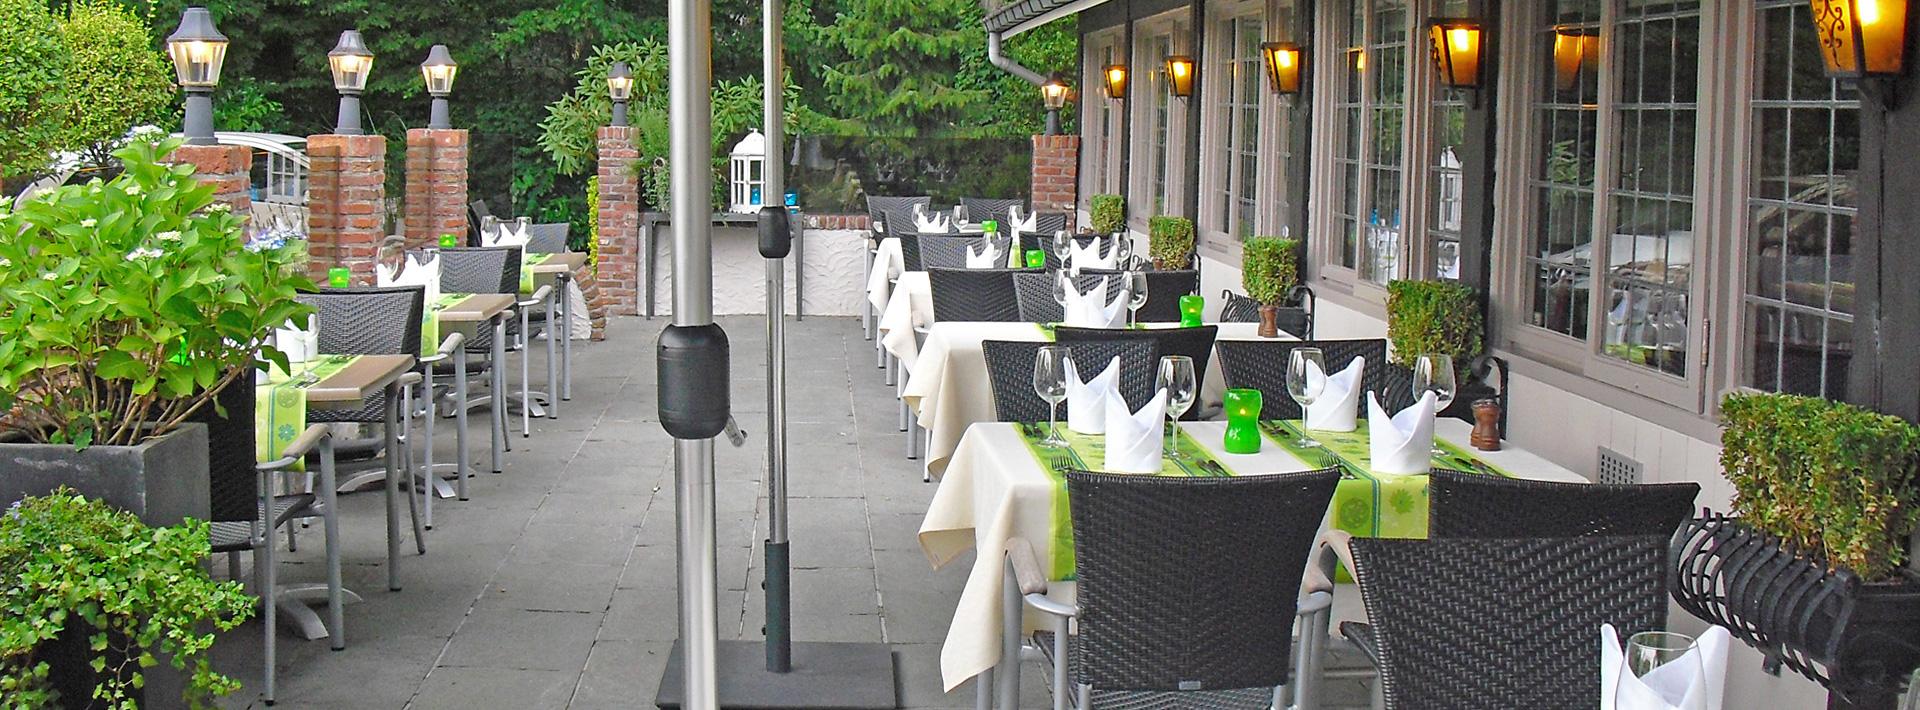 restaurant-malpertus-in-st-niklaas_CIMG0145